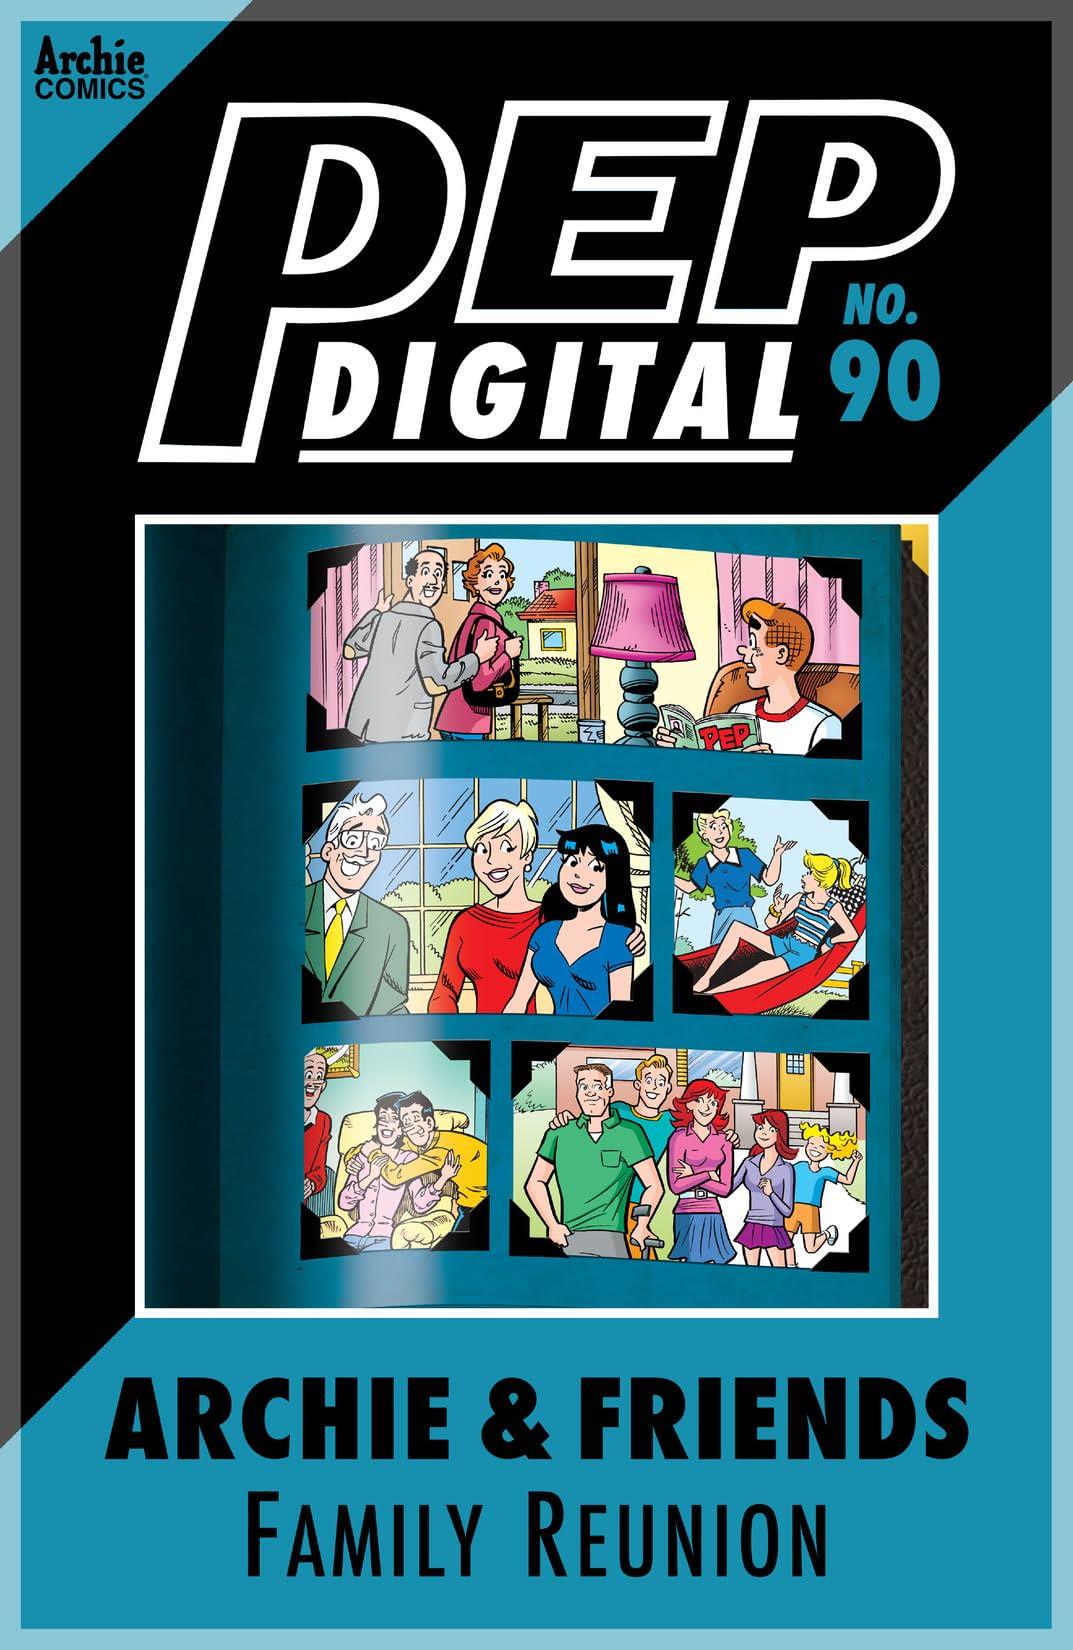 PEP Digital #90: Archie & Friends Family Reunion